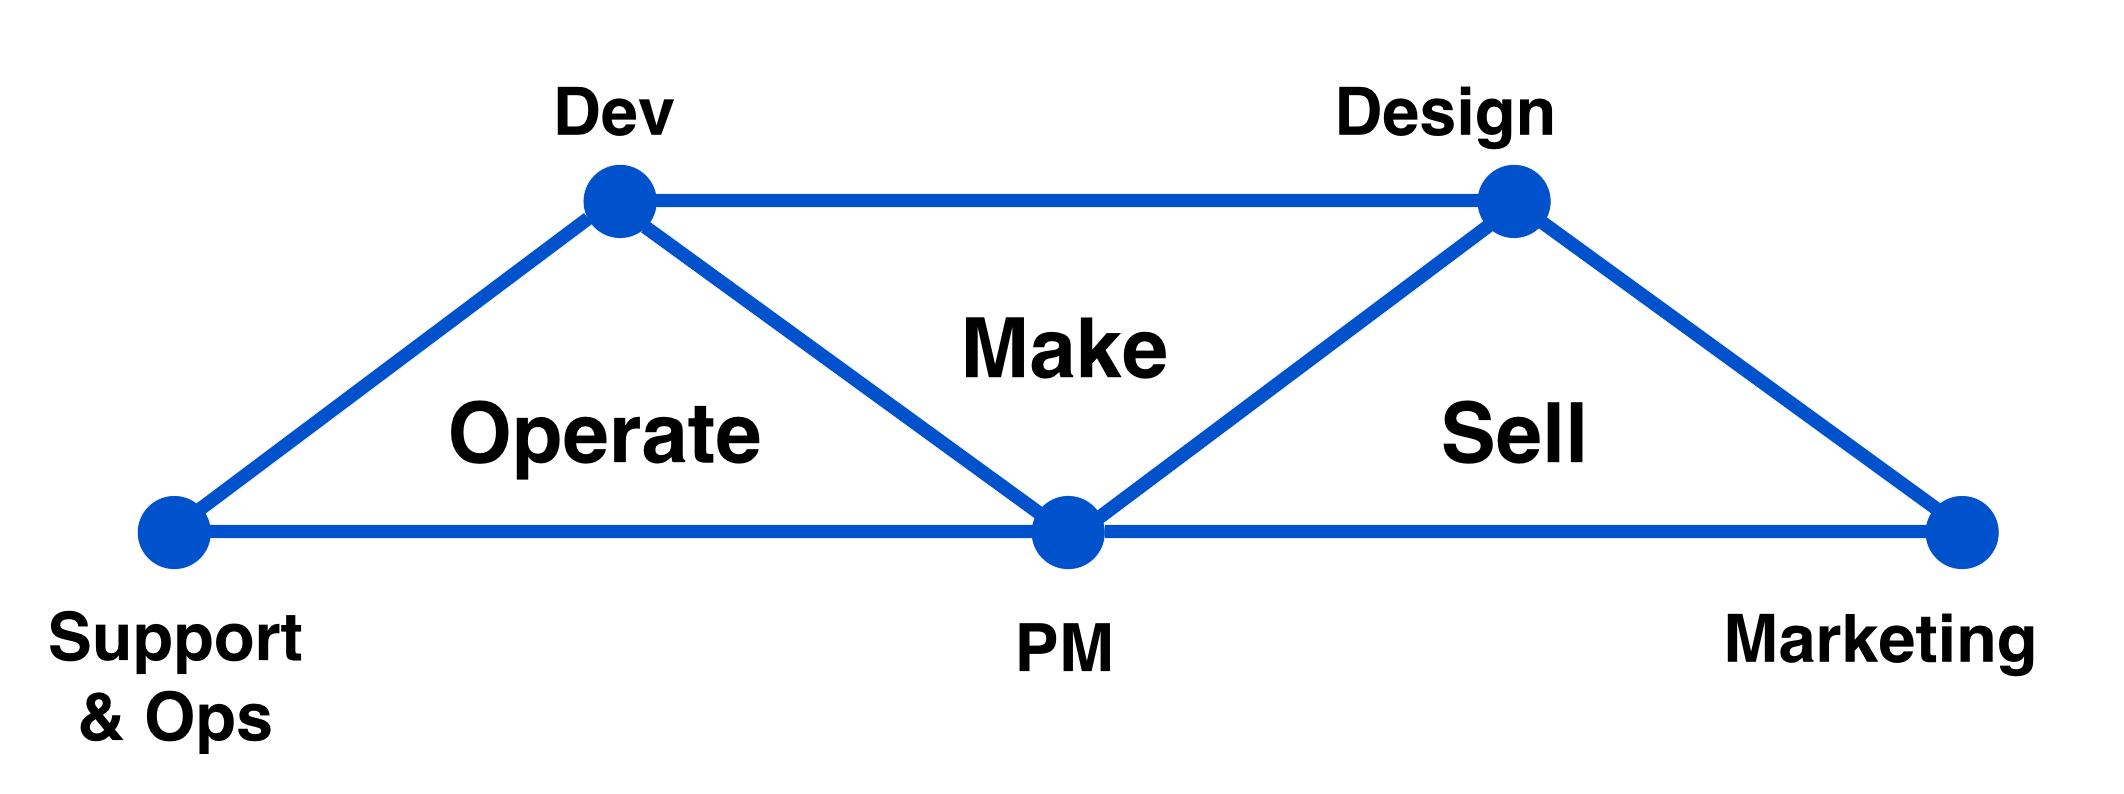 Tríadas de equipos de Atlassian | Orientador ágil de Atlassian